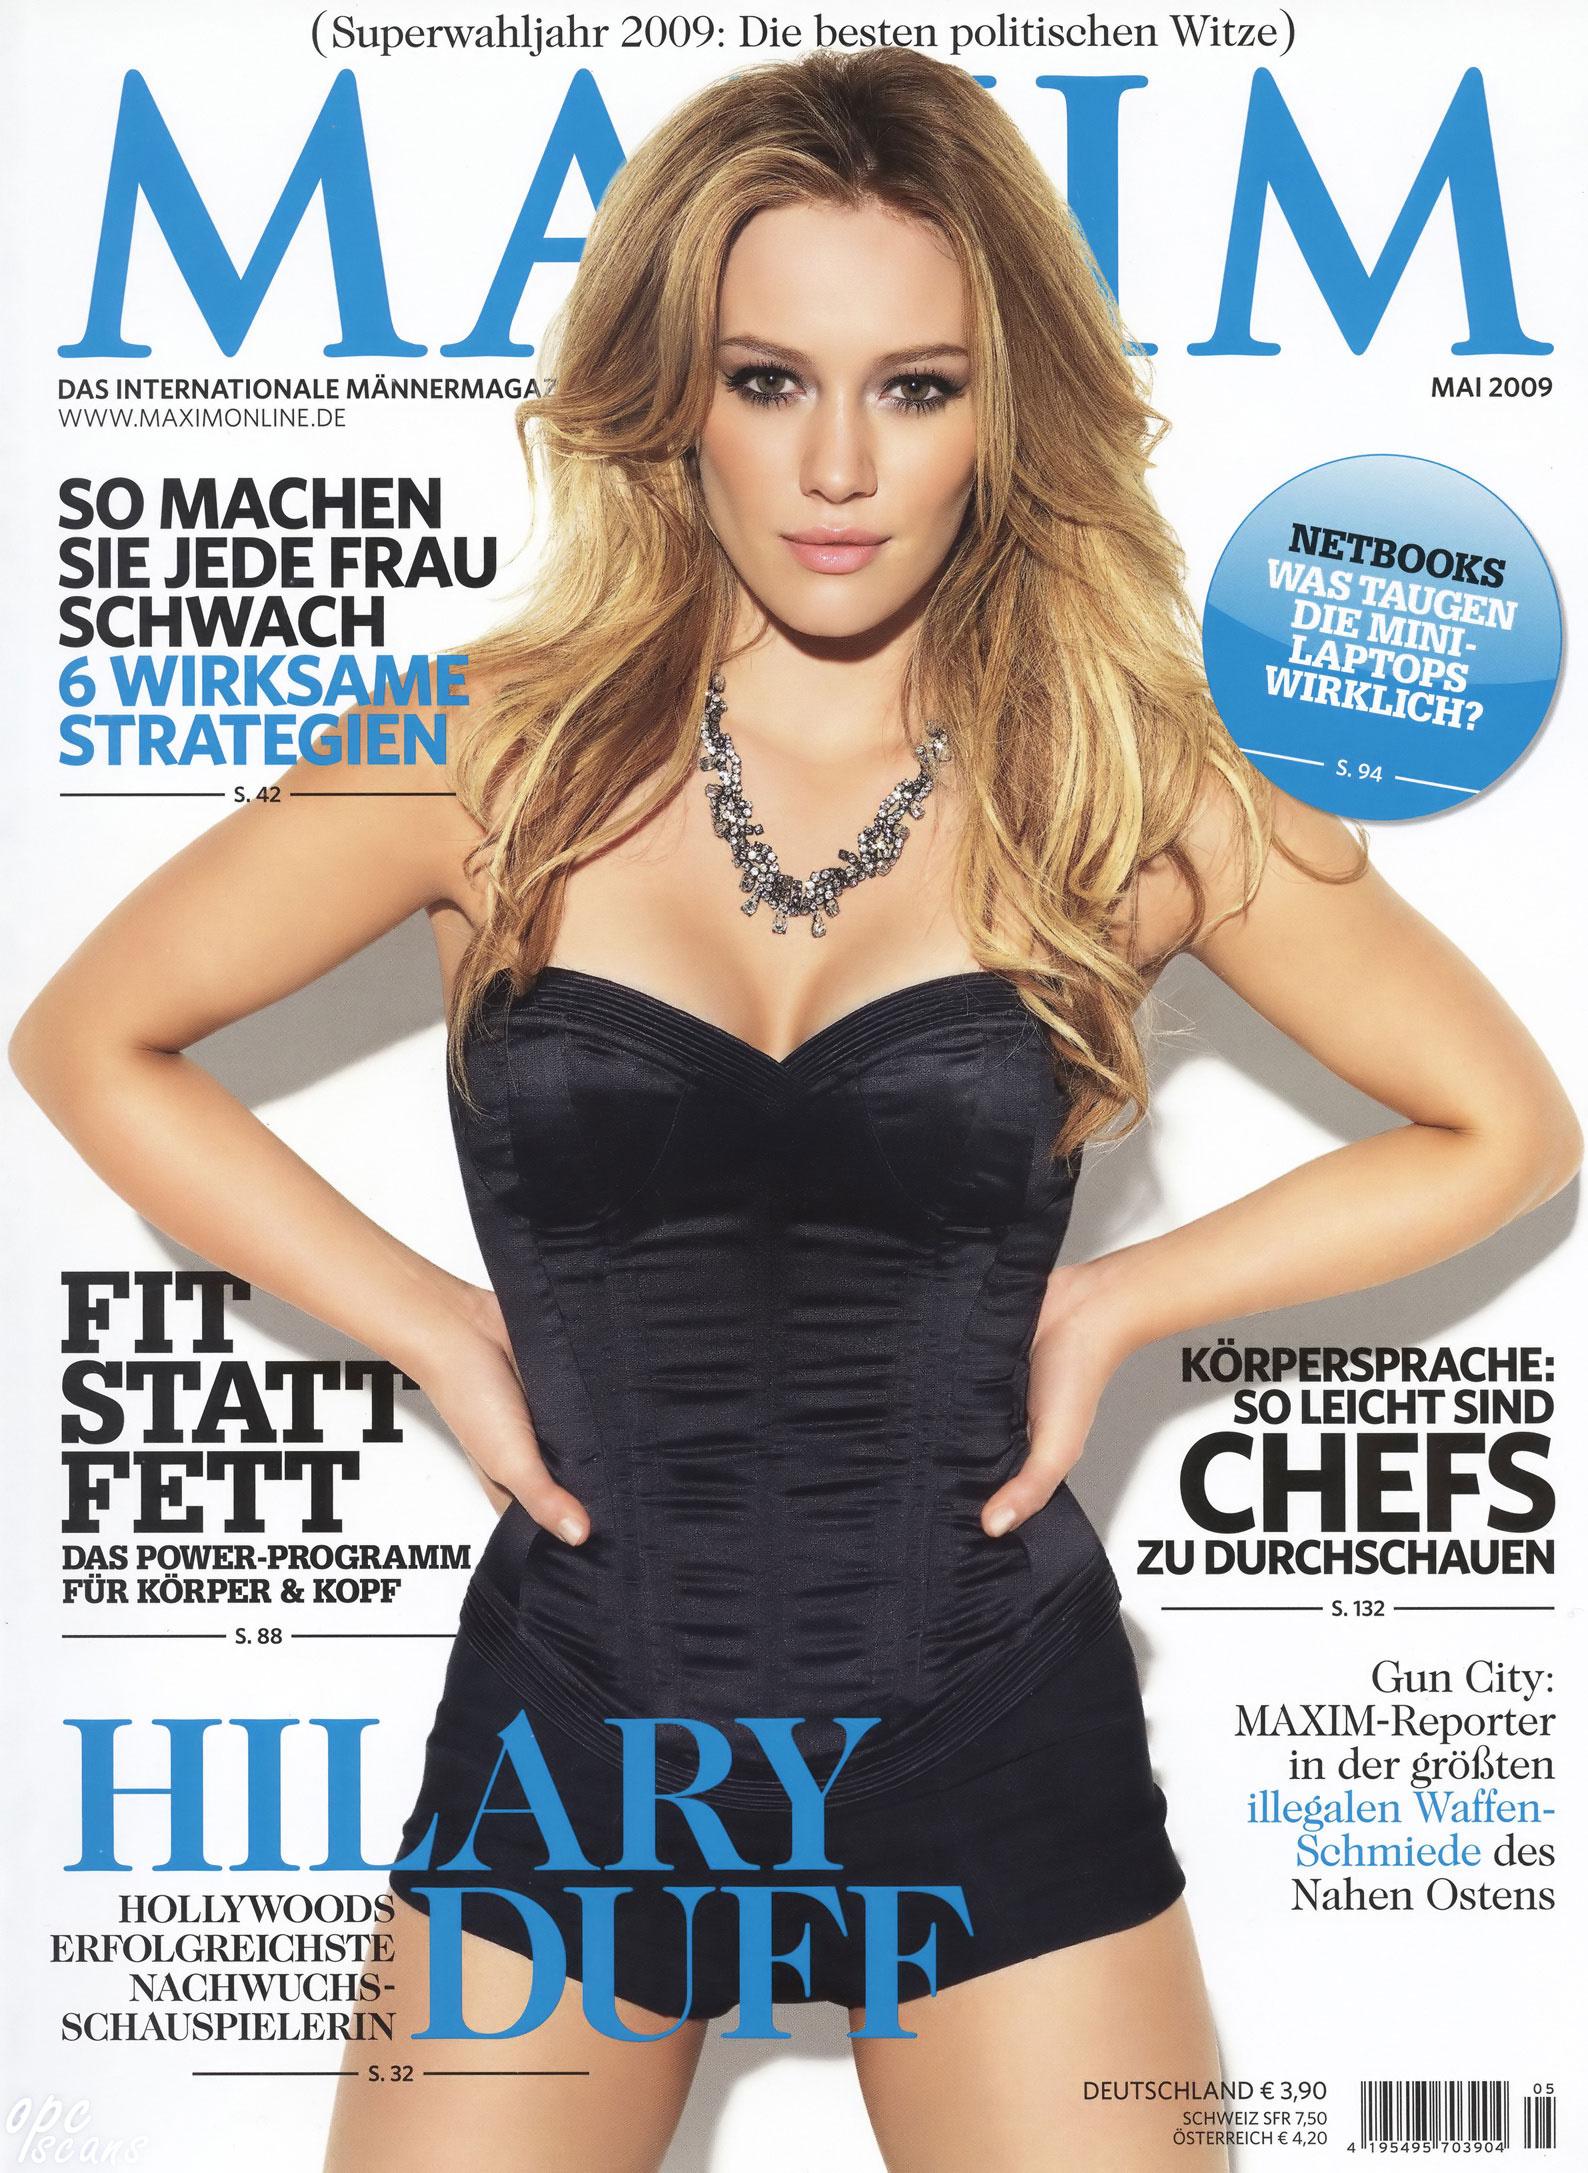 84331_Hilary_Duff_Maxim_Germany_Mai_2009_122_845lo.jpg